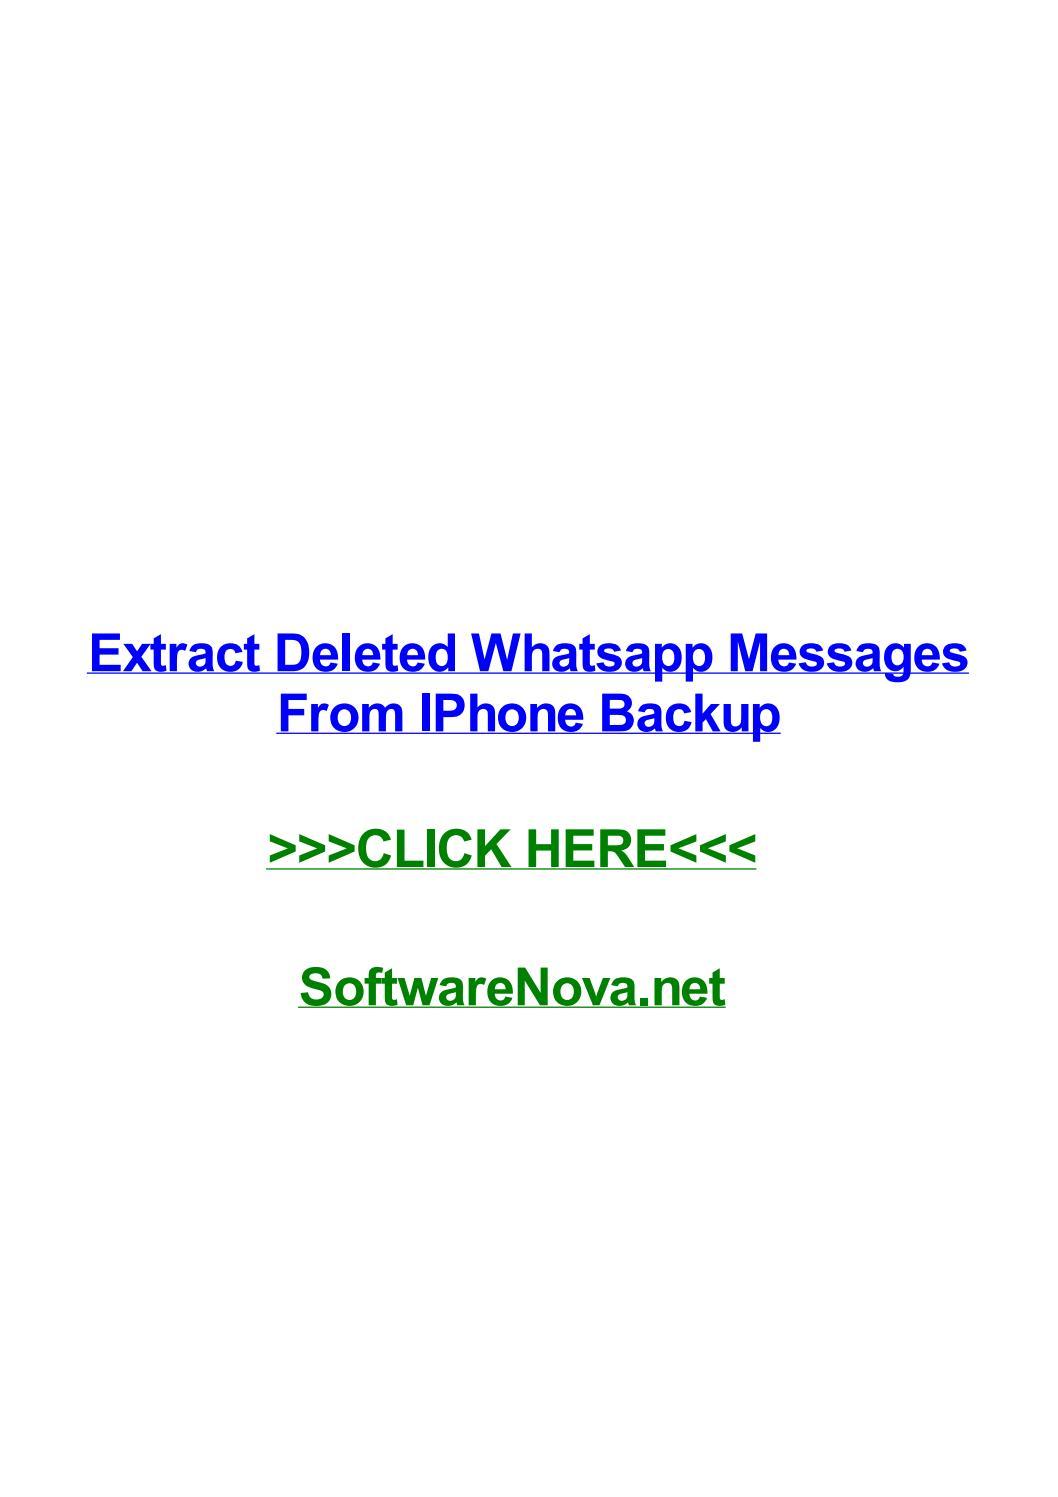 spiare whatsapp iphone mac address